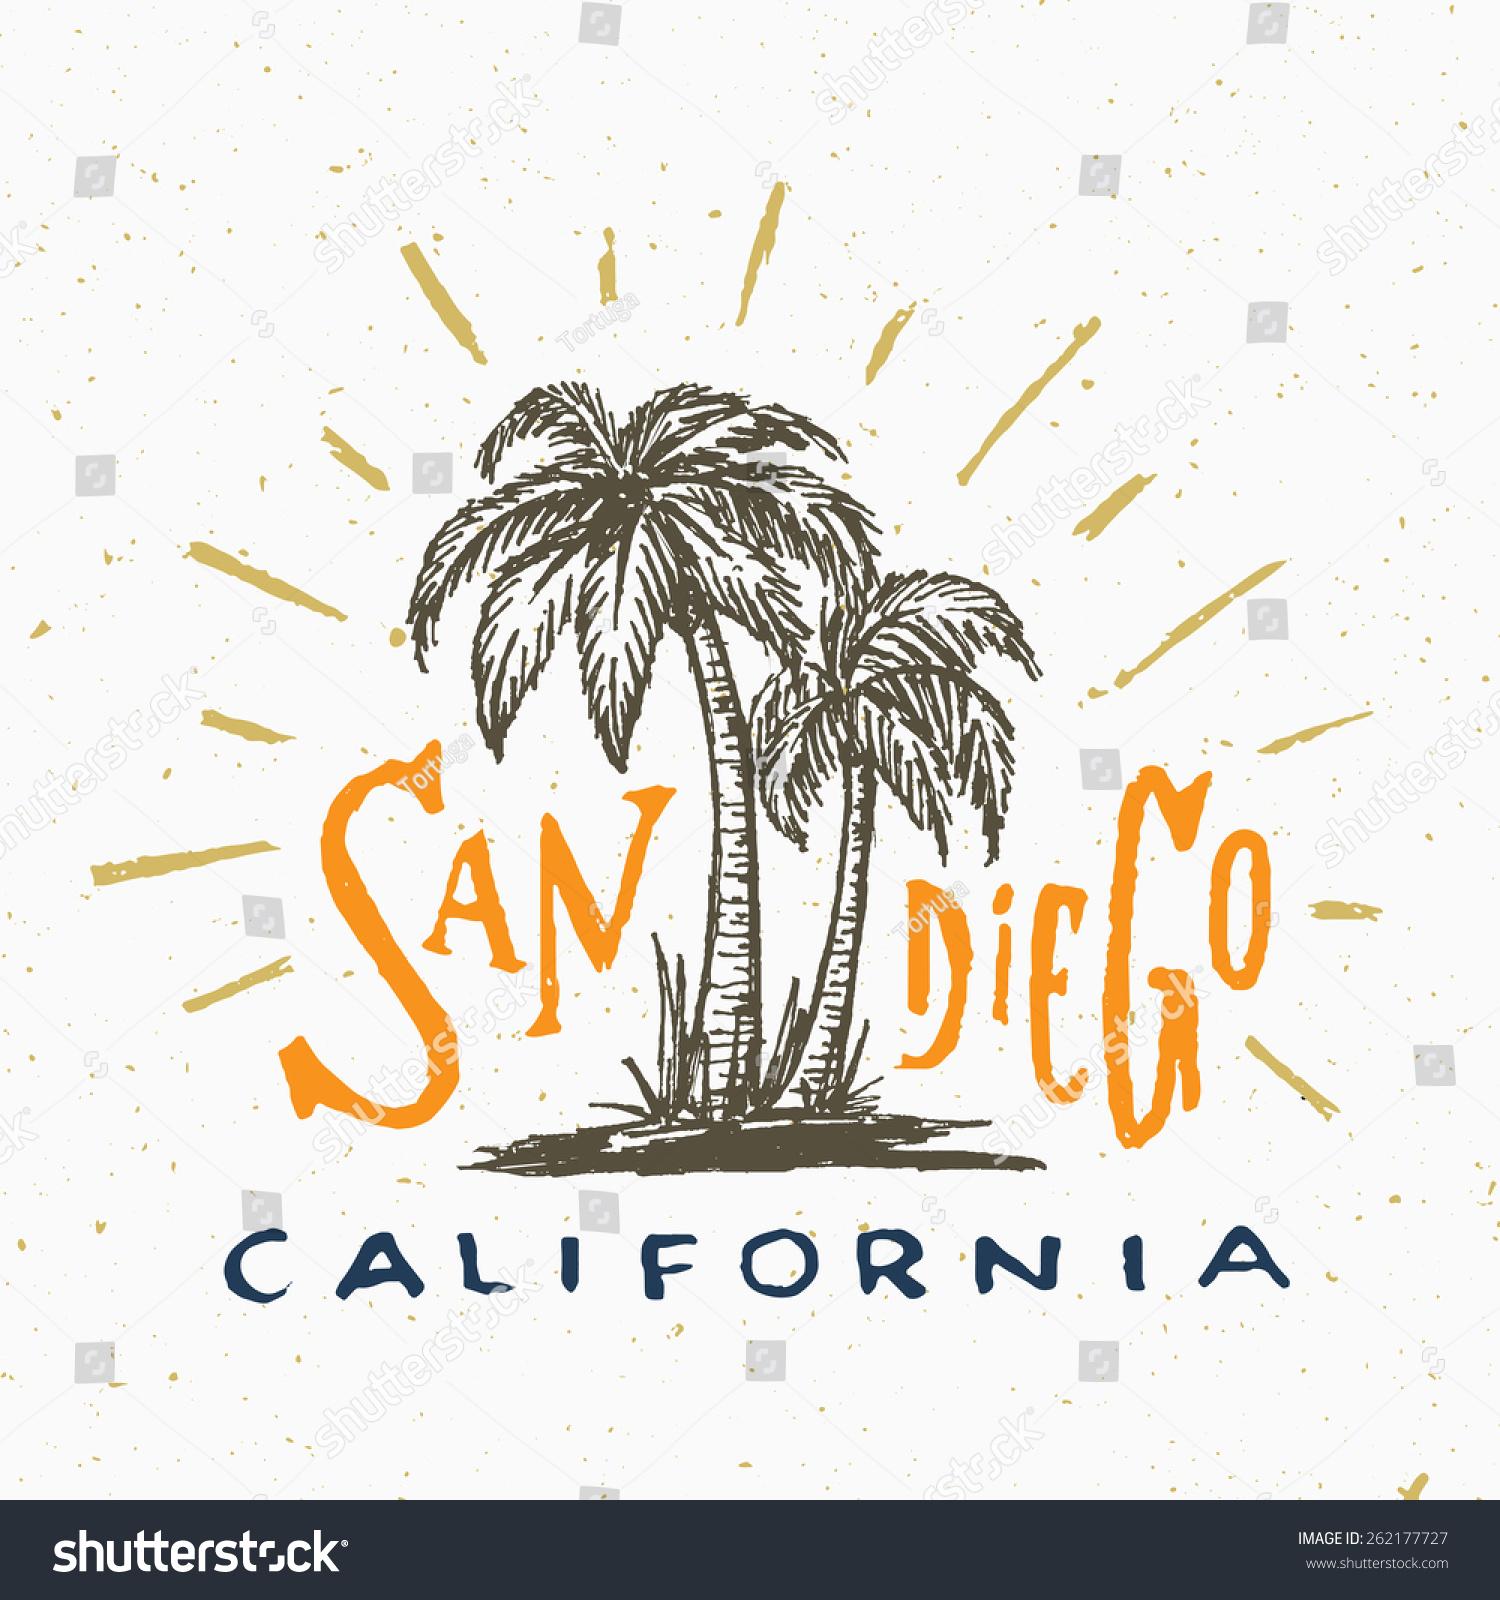 Shirt design san diego - San Diego California T Shirt Graphic Vintage Apparel Fashion Tee Design Retro Urban Youth